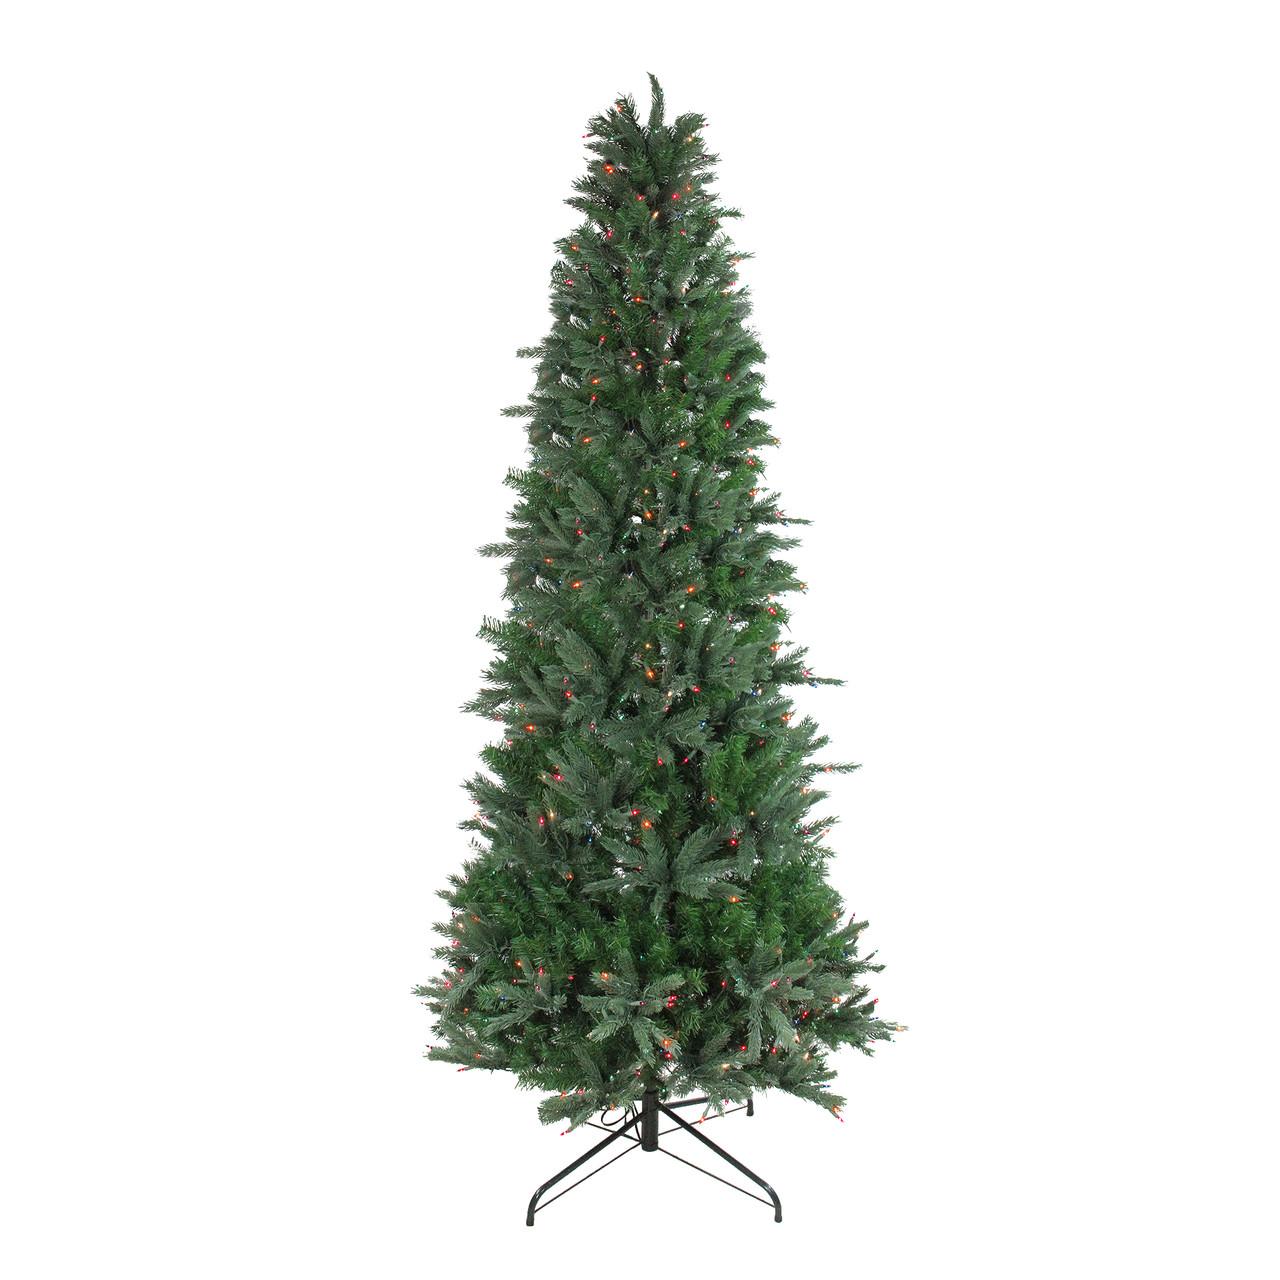 Multi Color Pre Lit Christmas Trees: 9.5' Pre-Lit Slim Vermont Fir Artificial Christmas Tree